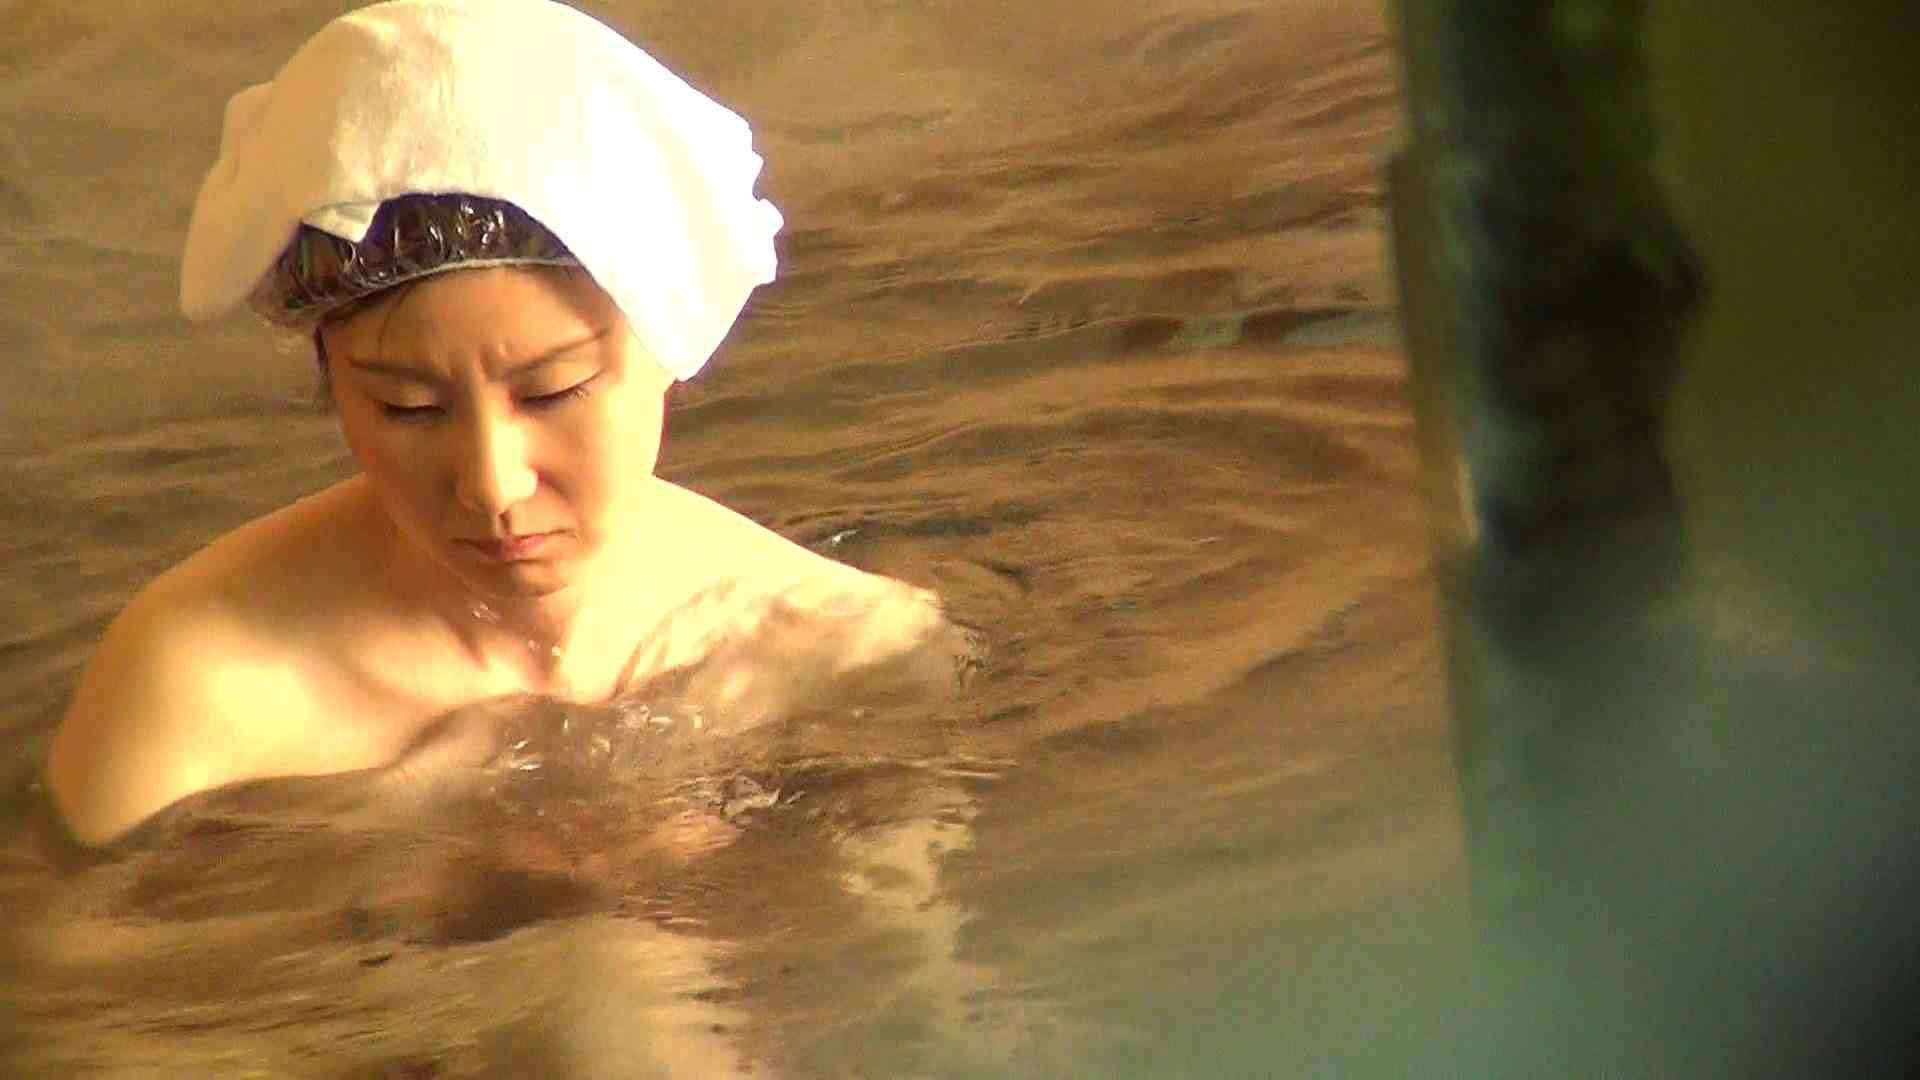 Aquaな露天風呂Vol.278 露天 エロ無料画像 88連発 74